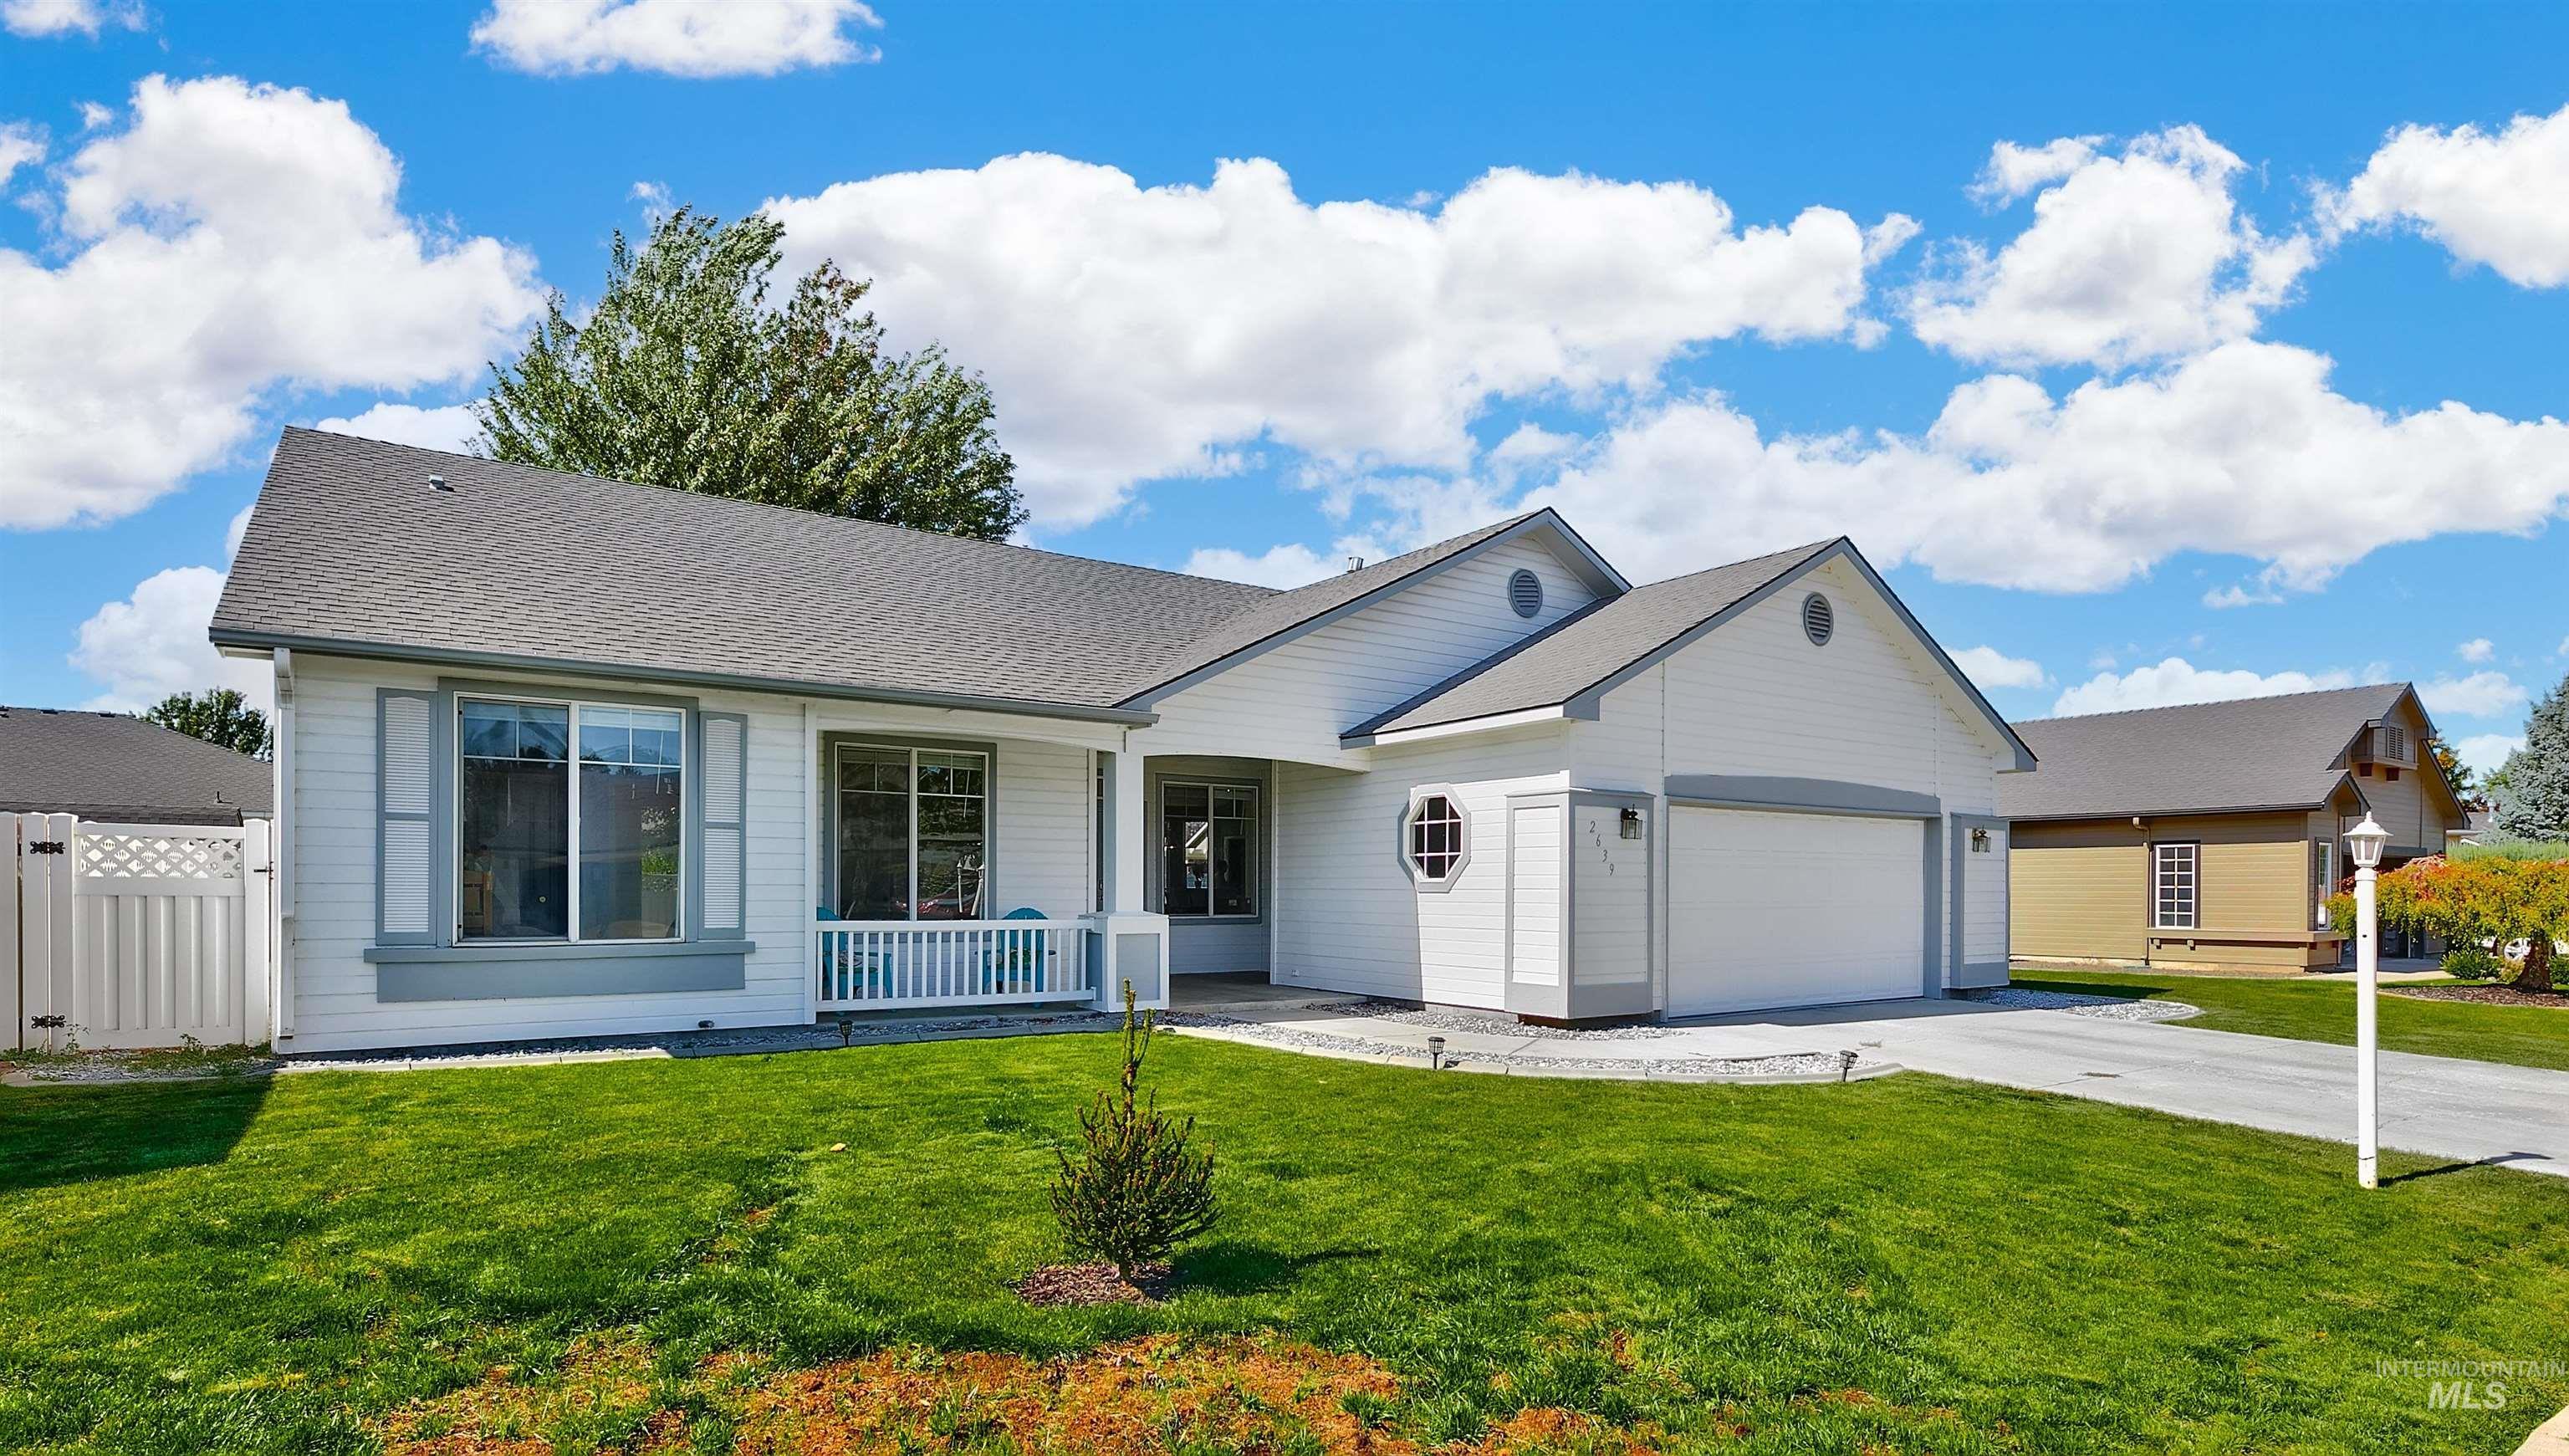 2639 N Tangent Property Photo 1